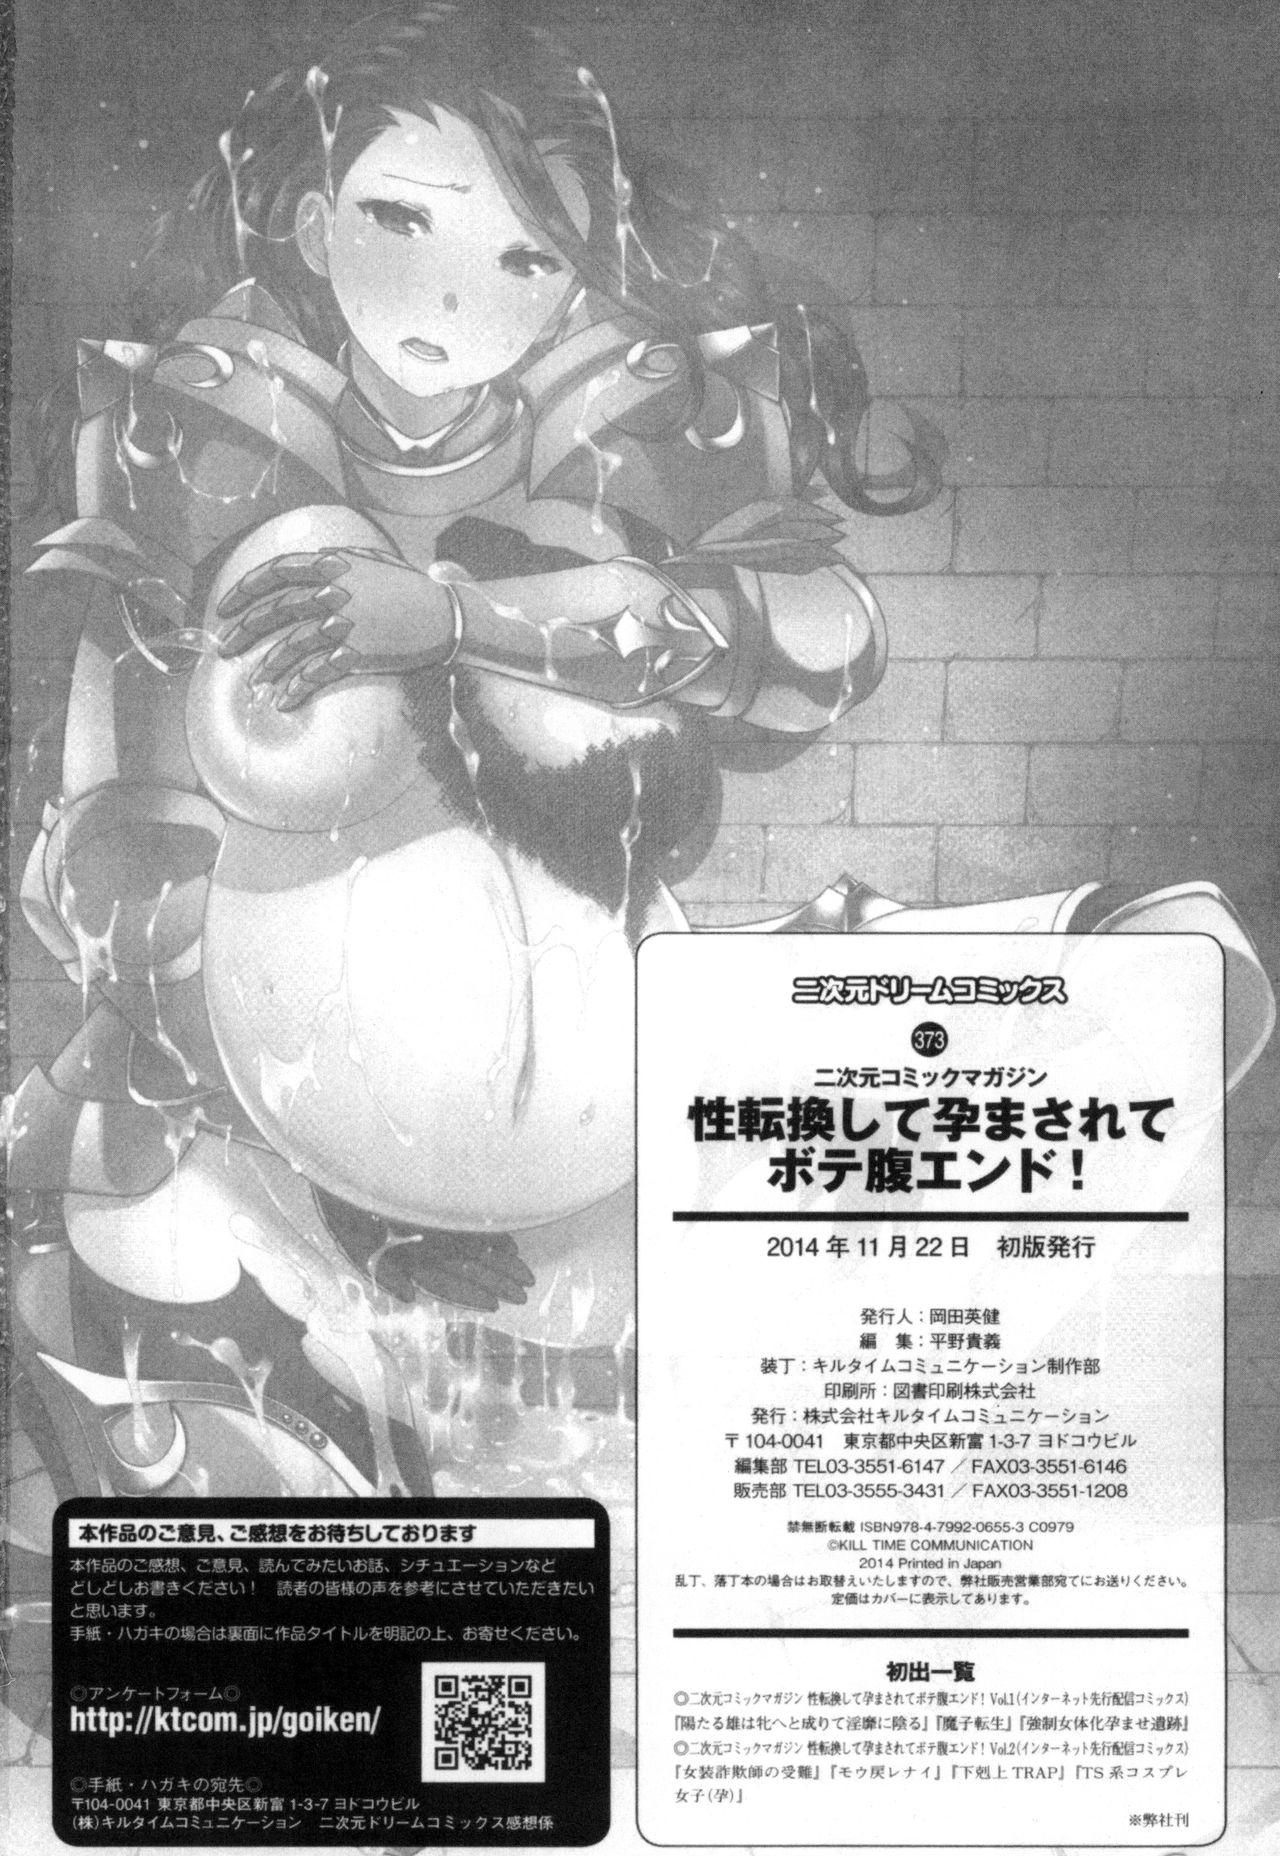 2D Comic Magazine Seitenkan Shite Haramasarete Botebara End! | 性轉換與懷孕,滿腹精液收場! 144